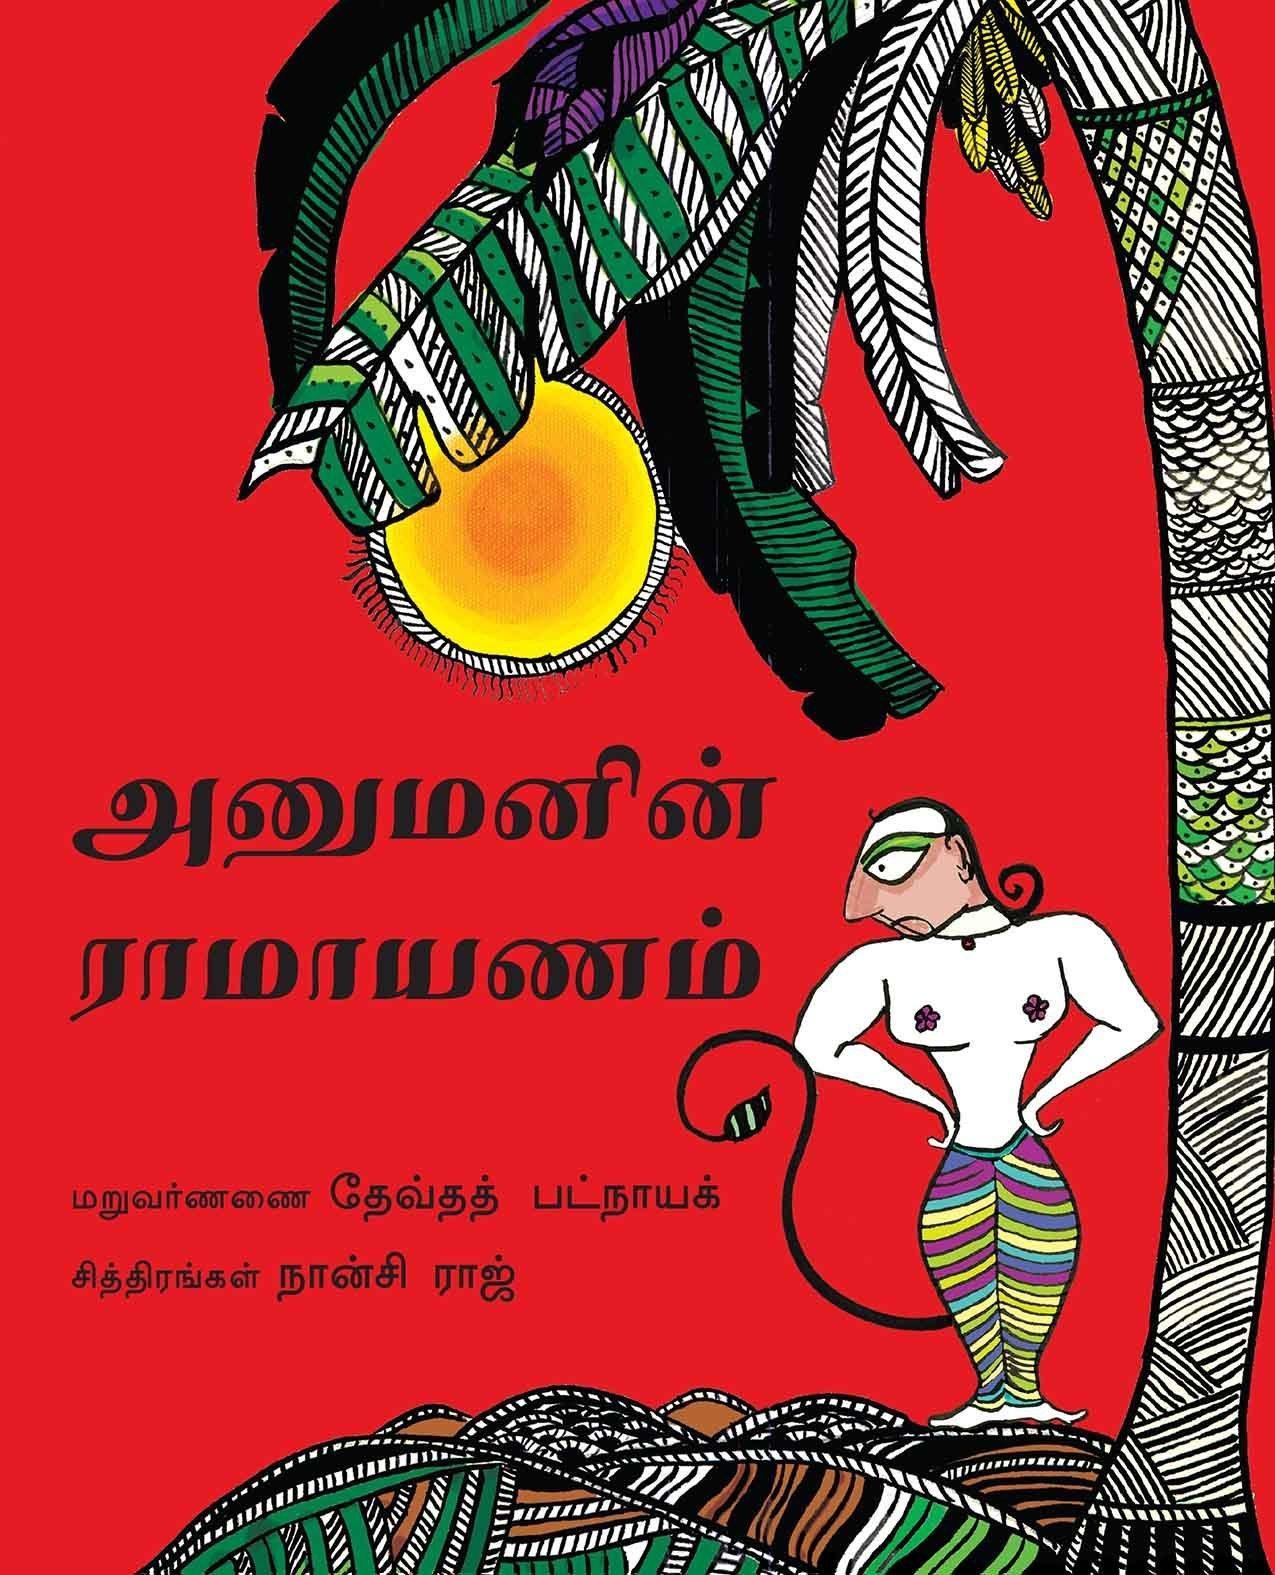 Hanumans Ramayana/Hanumanin Ramayanam (Tamil) Our Myths Age_6+ ISBN: 9788181467539